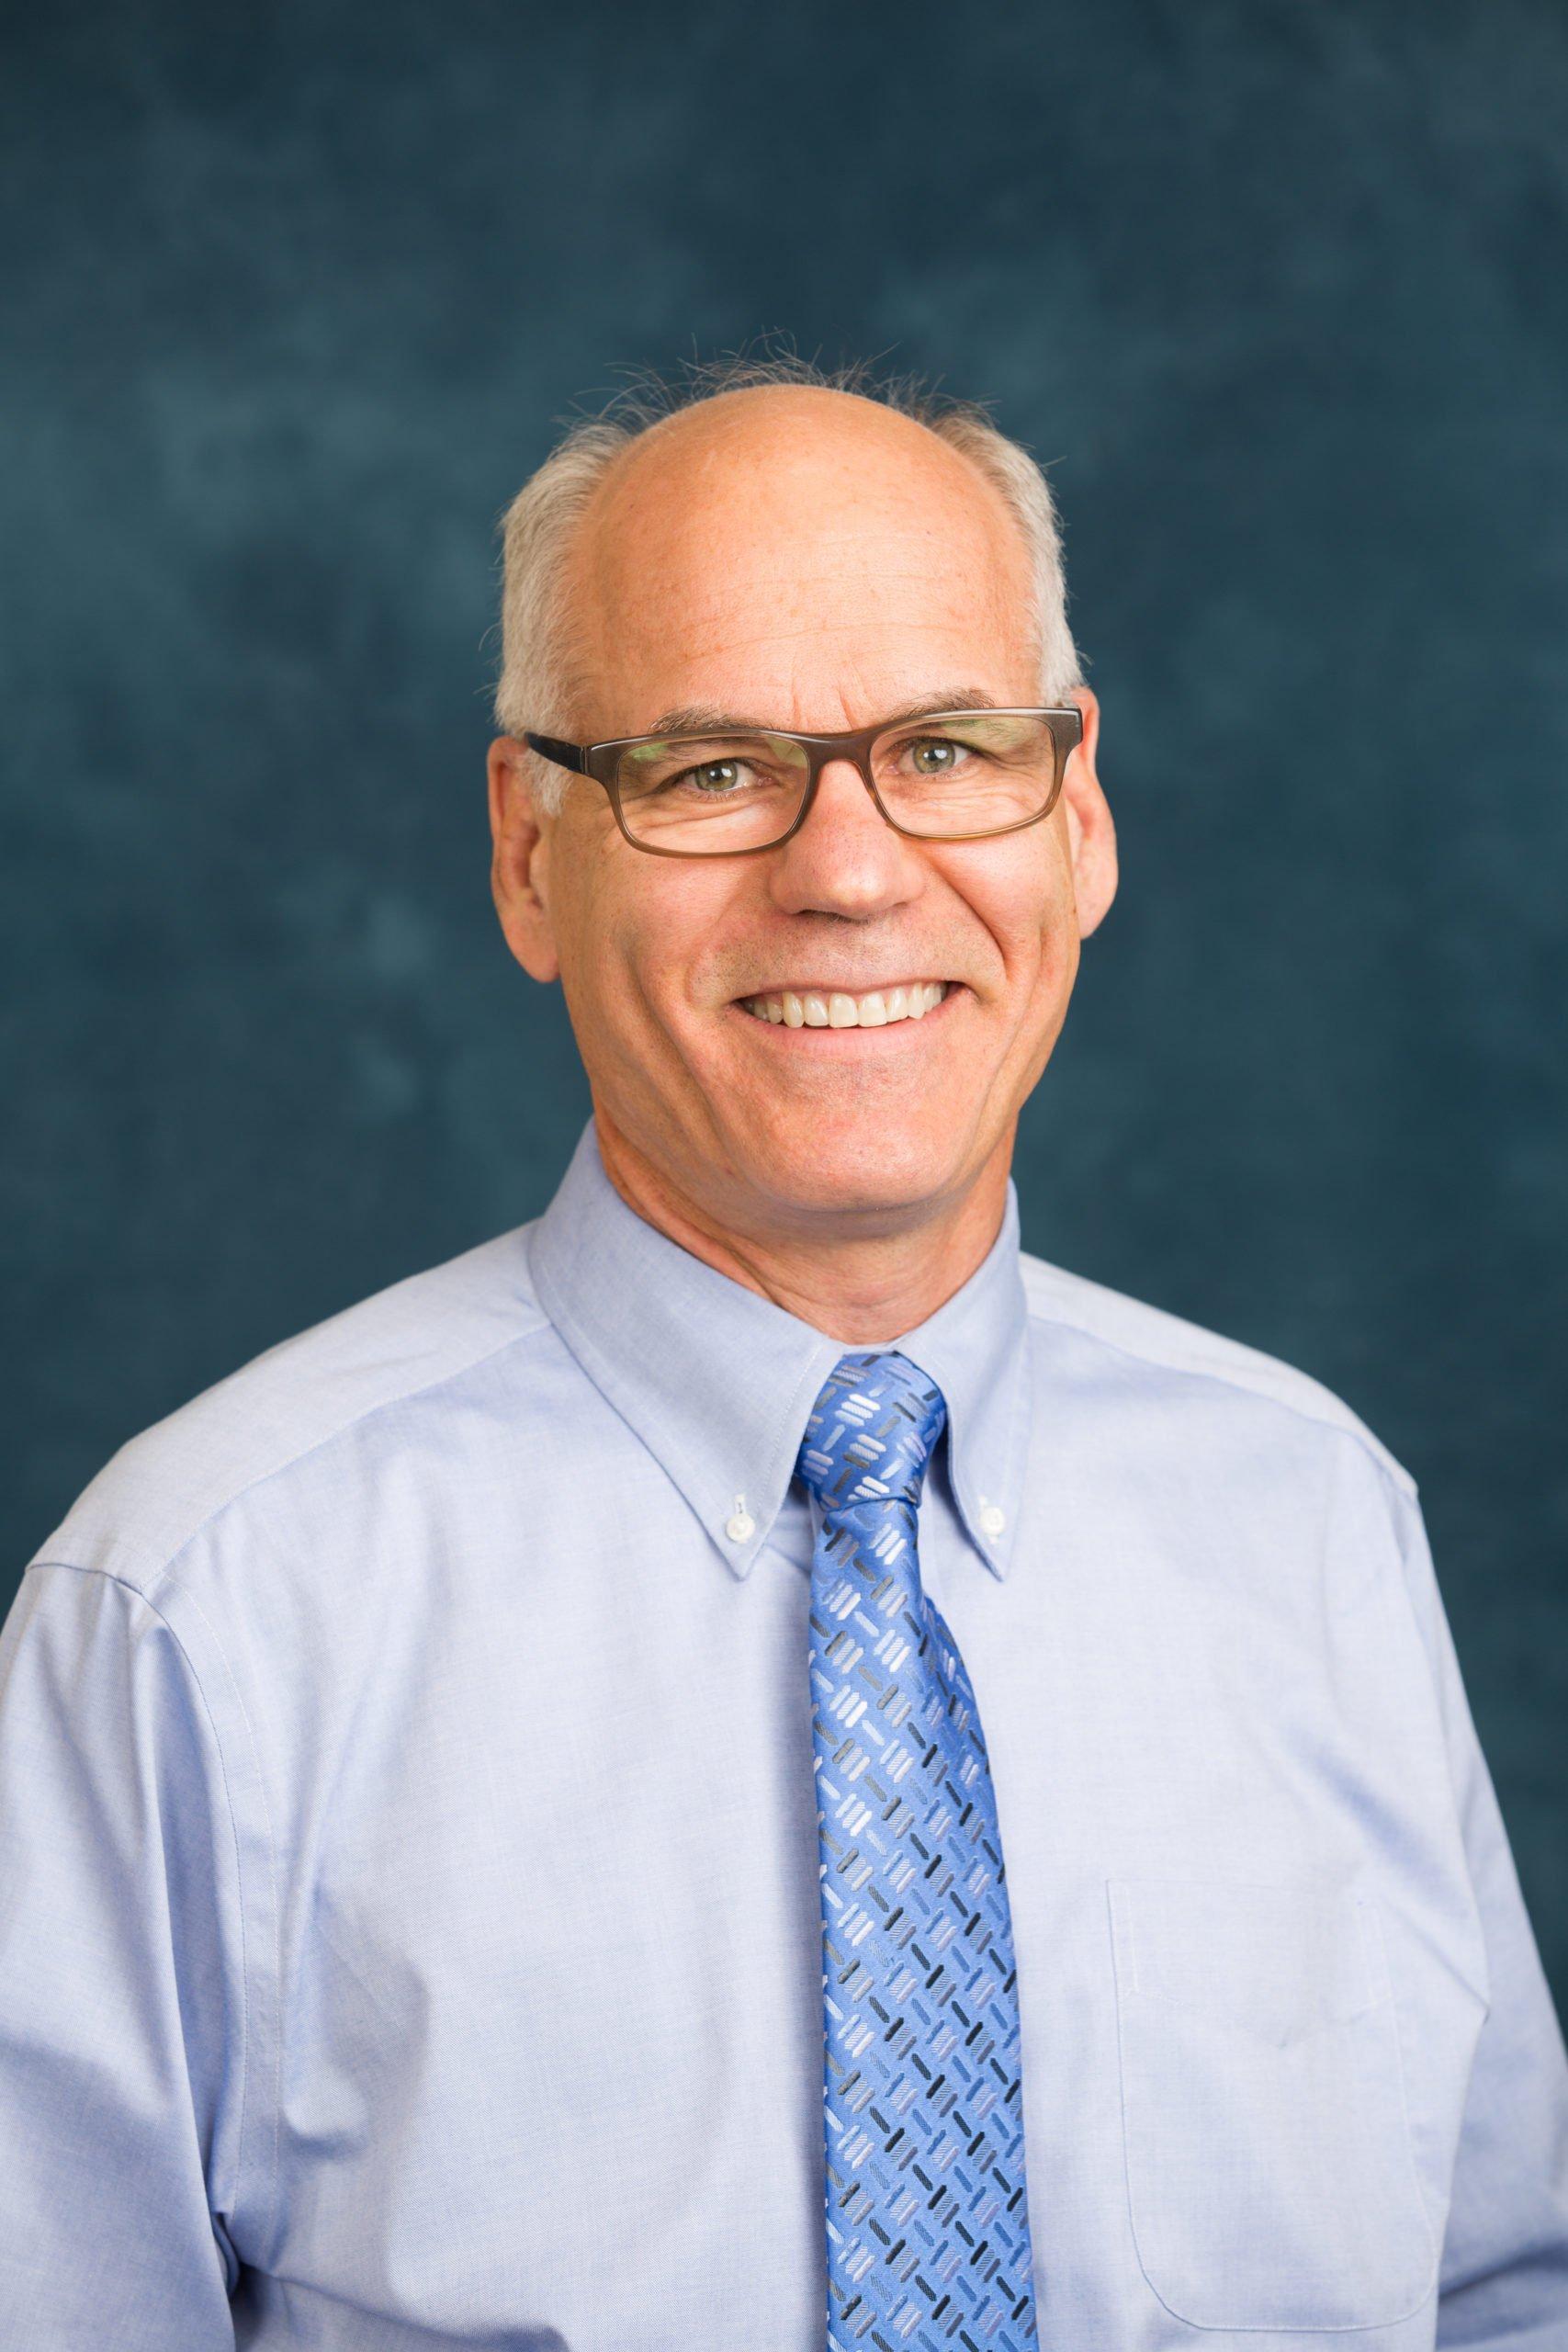 Thomas Reischl, PhD